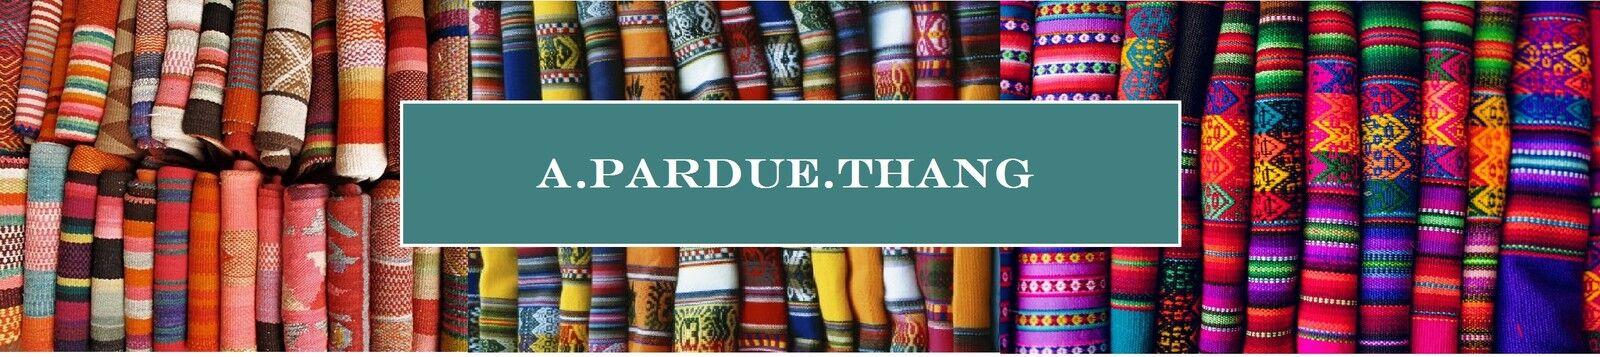 A_Pardue_Thang